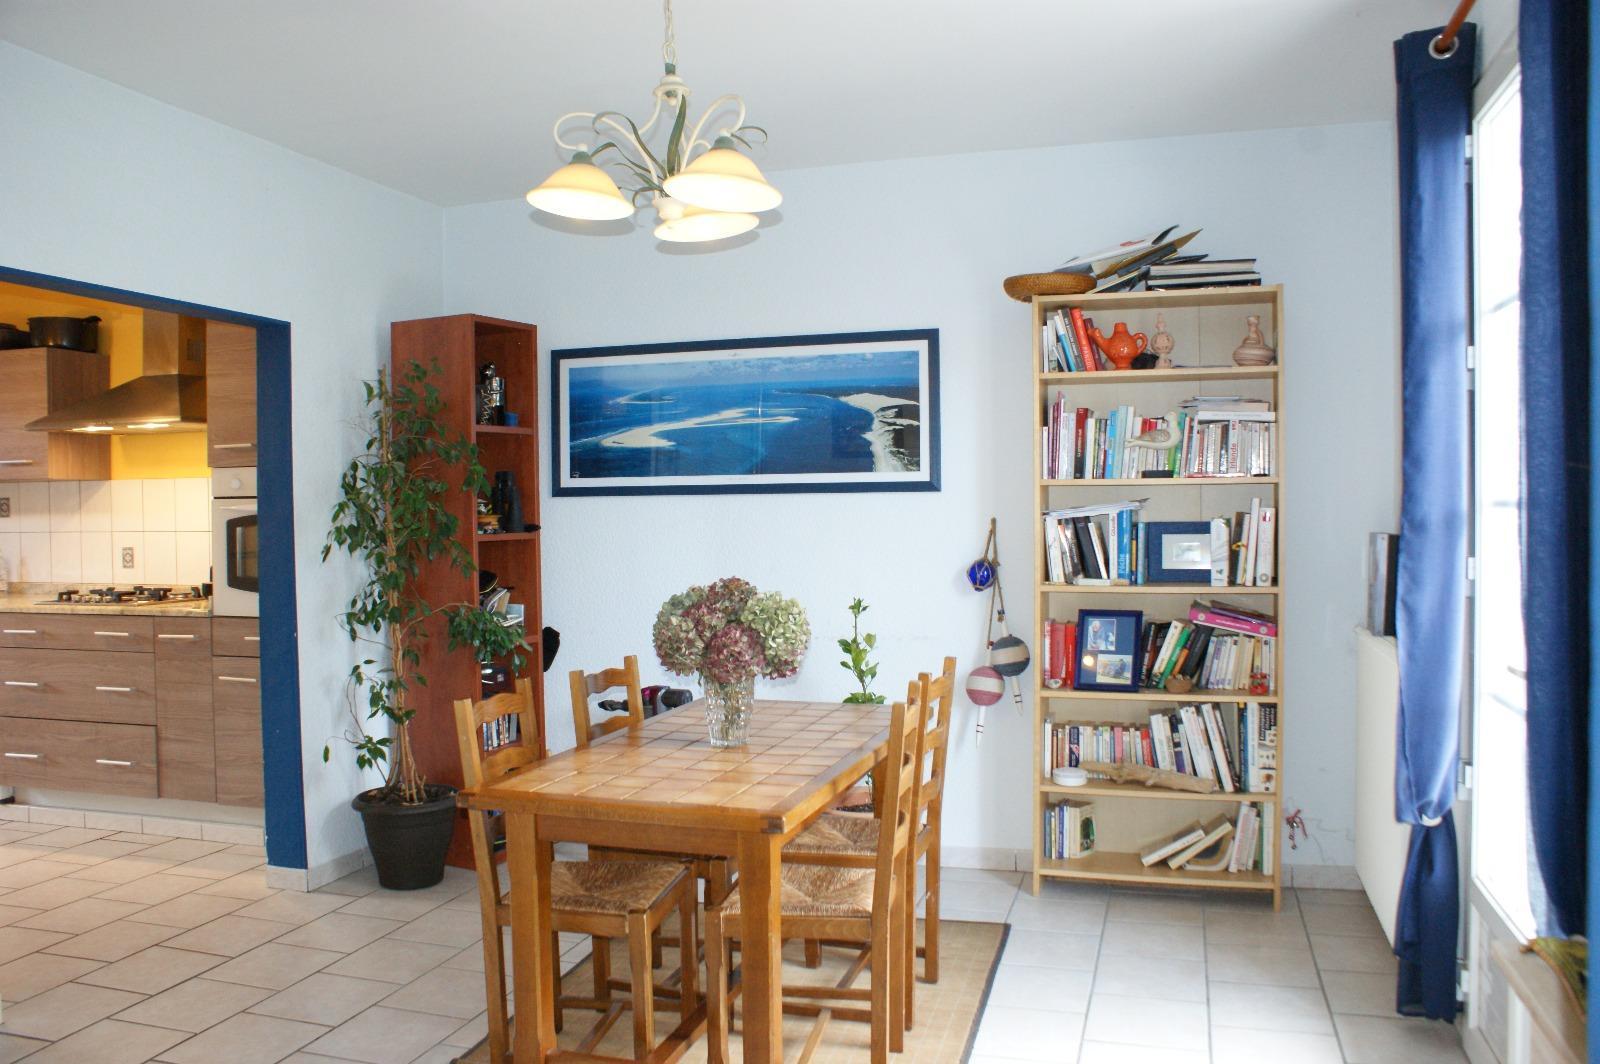 location maison gujan mestras 33470 passion immo d co. Black Bedroom Furniture Sets. Home Design Ideas